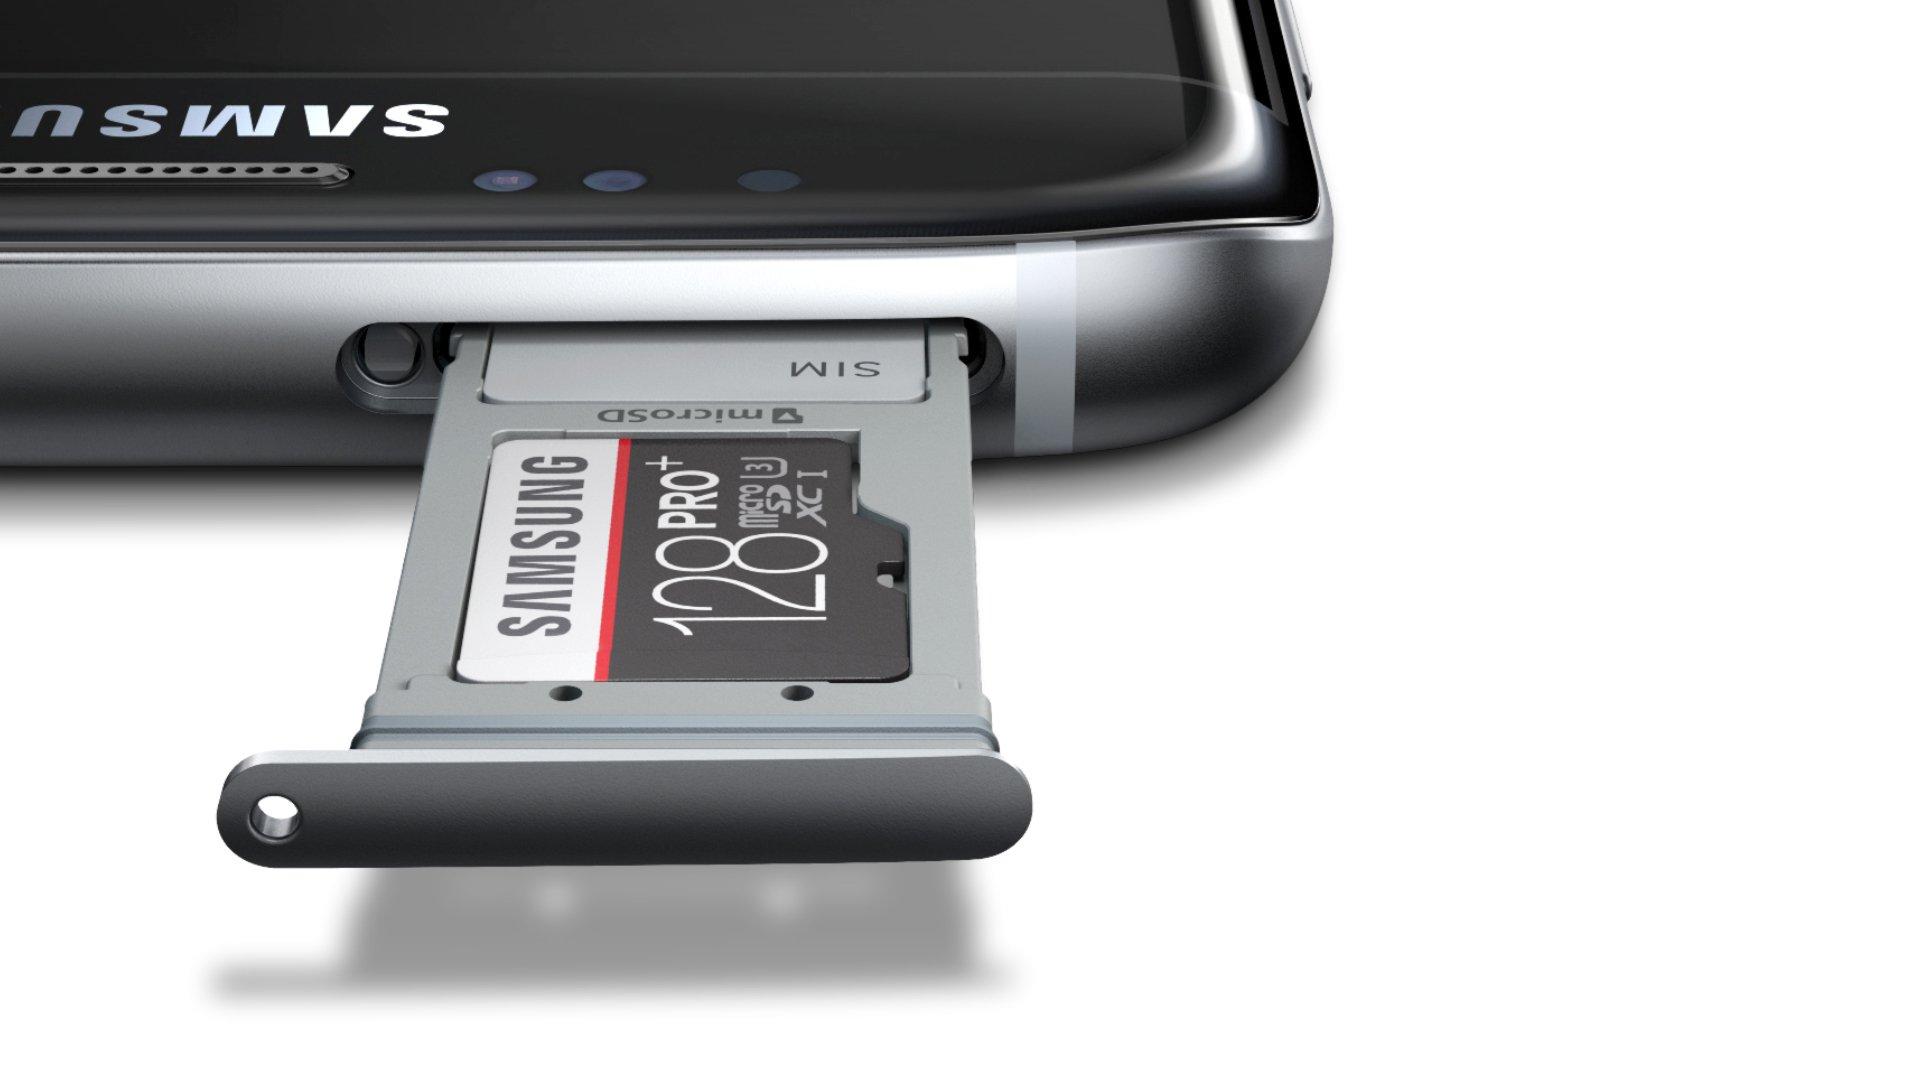 Galaxy-S7-edge-fente-microsd